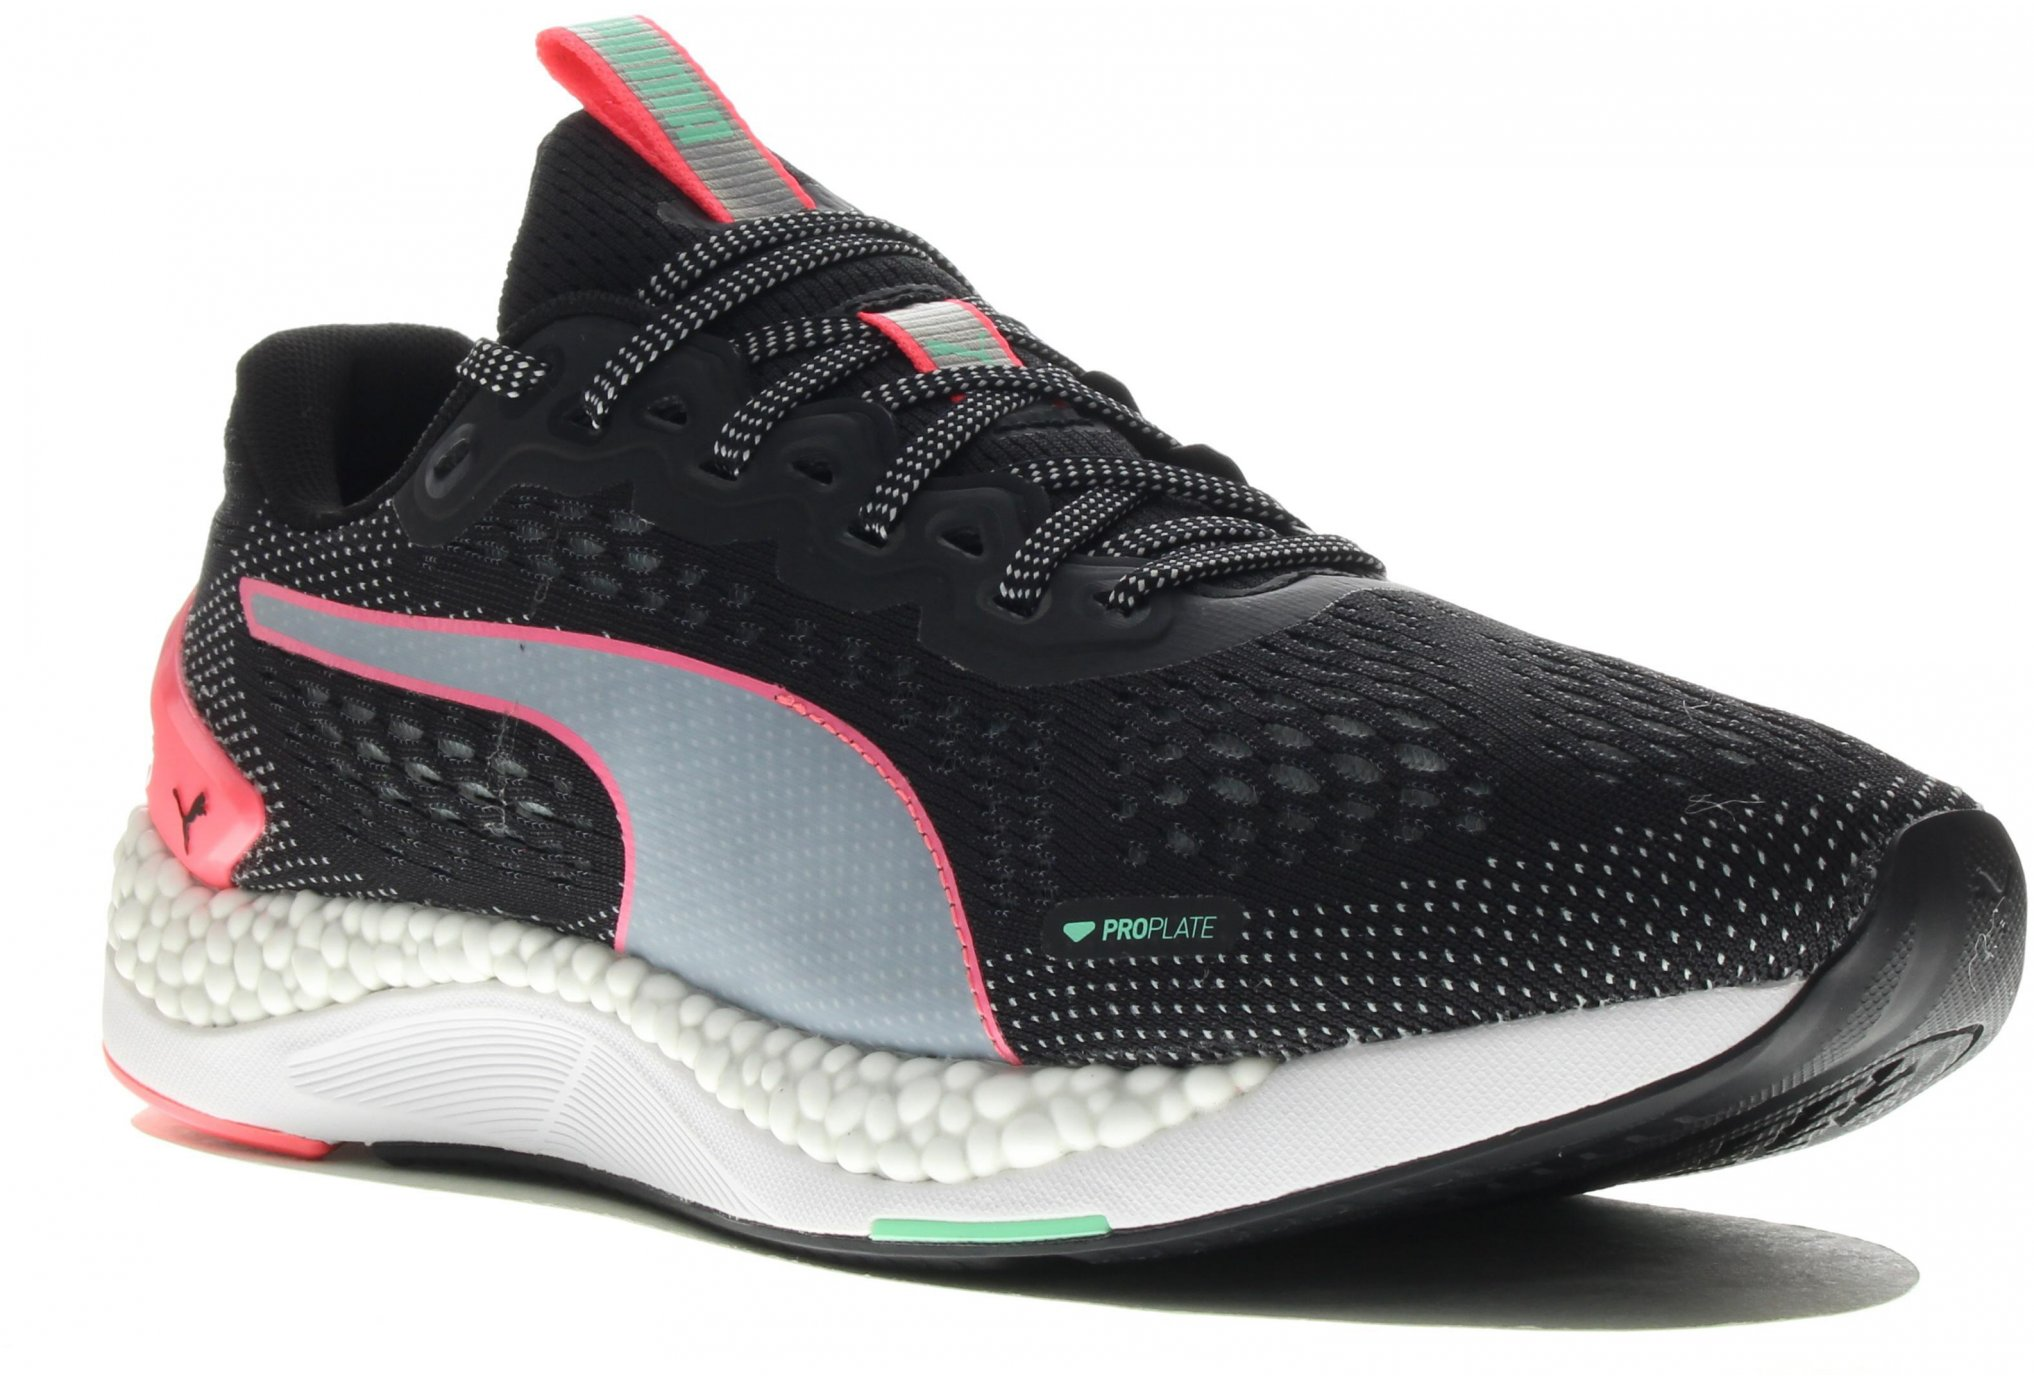 Puma Speed 600 2 W Diététique Chaussures femme